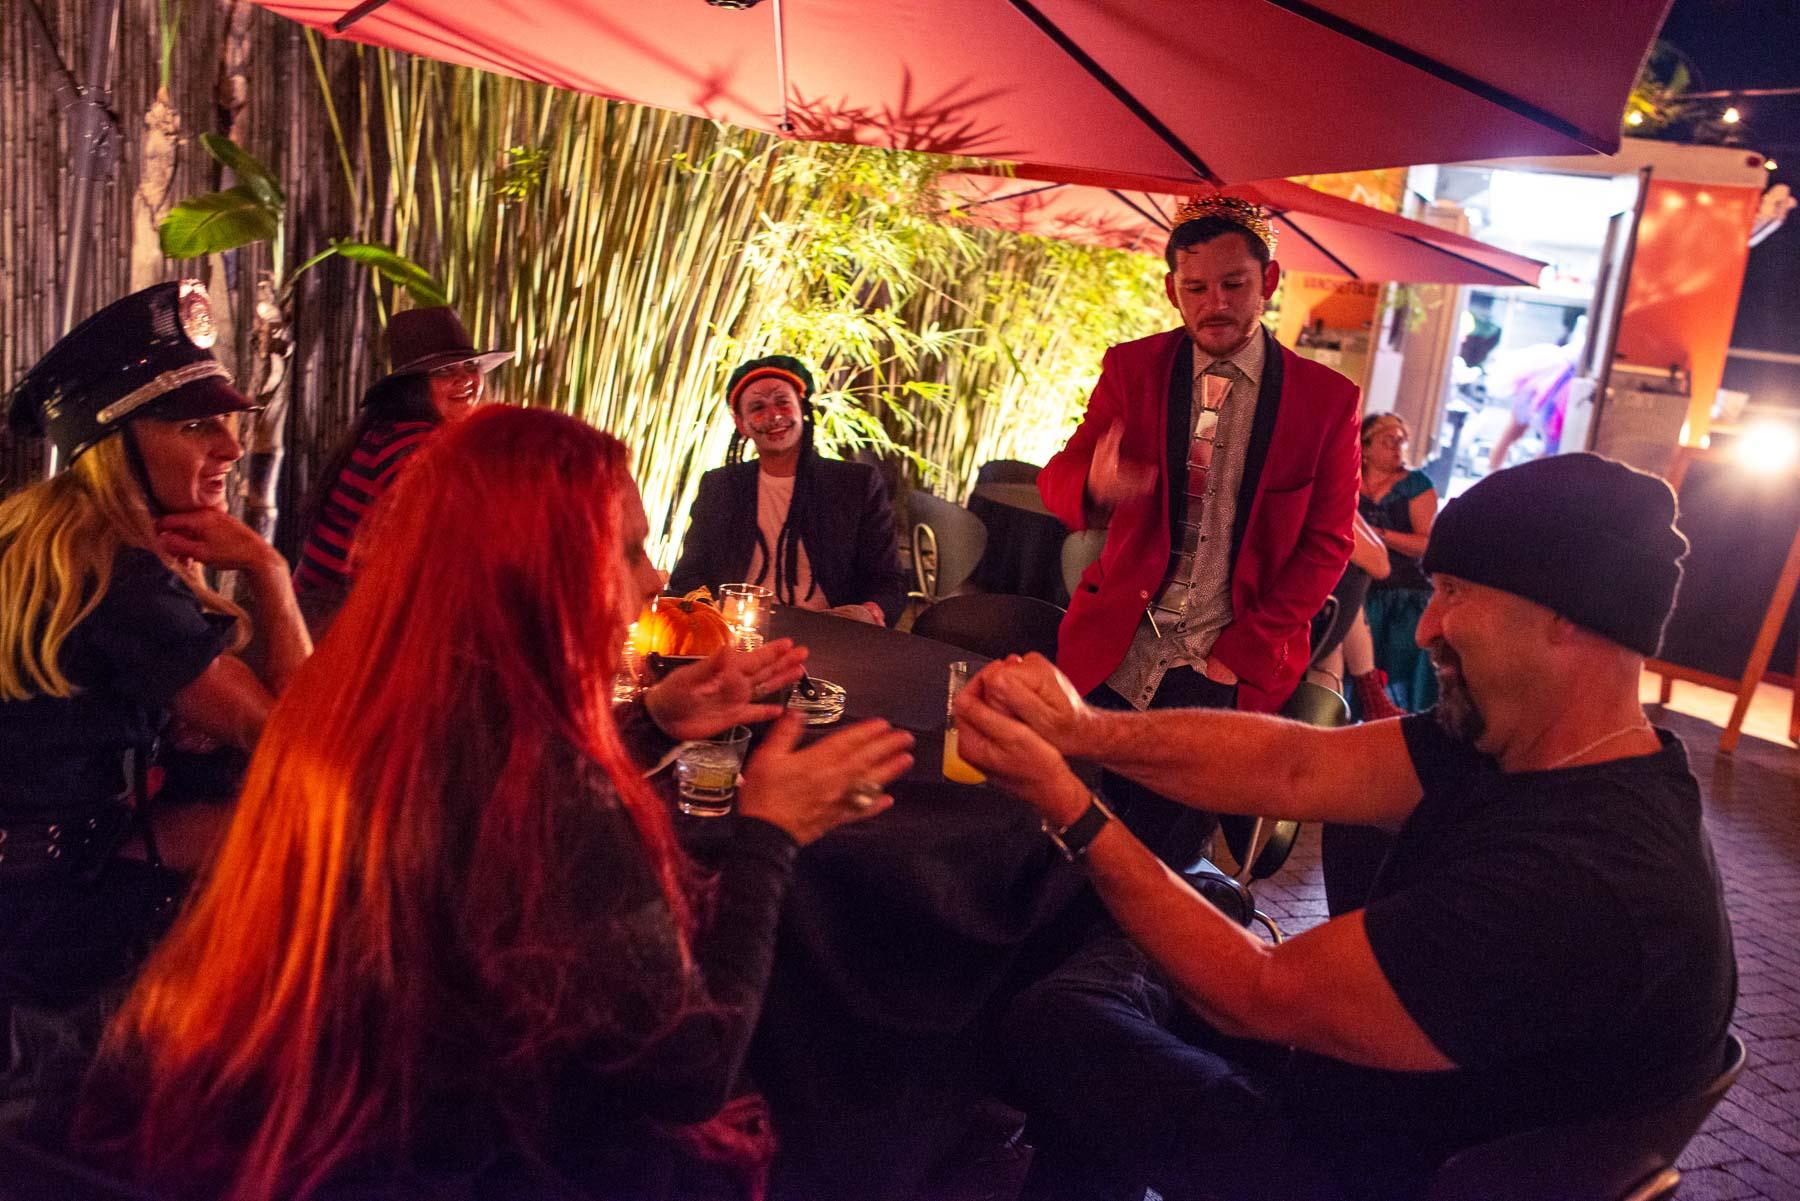 Novaween 13 Costumes and Contests on Halloween Night 10-31-2019 at Downtown St. Pete venue NOVA 535 Corv Van Valin Magician